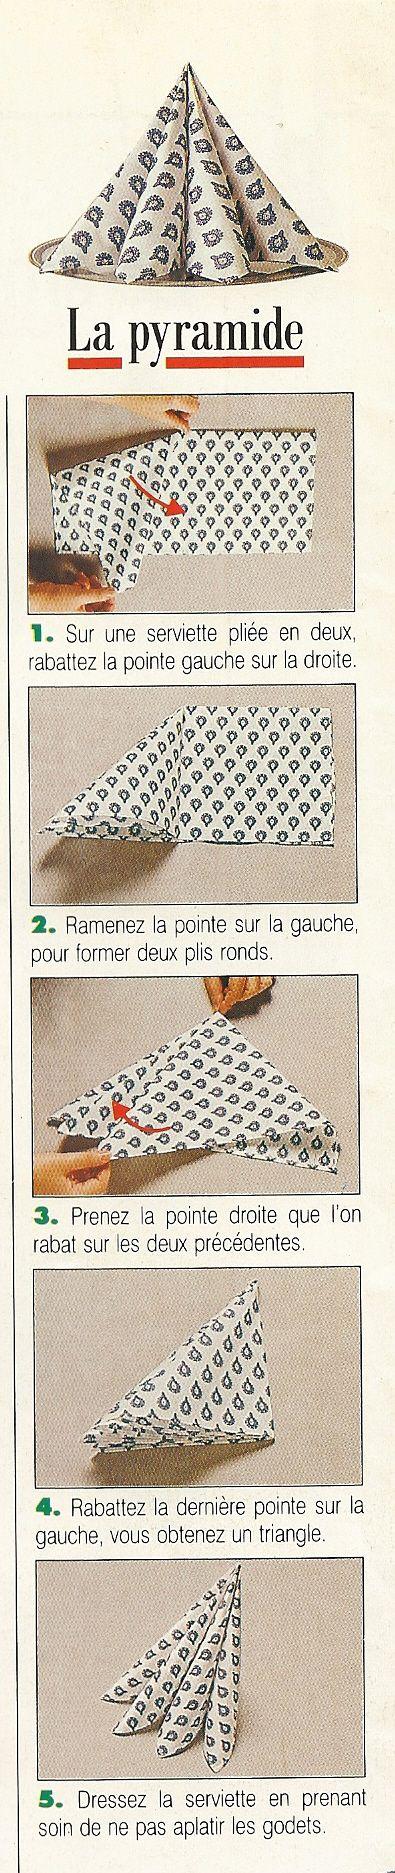 Pliage de serviettes en forme de pyramide